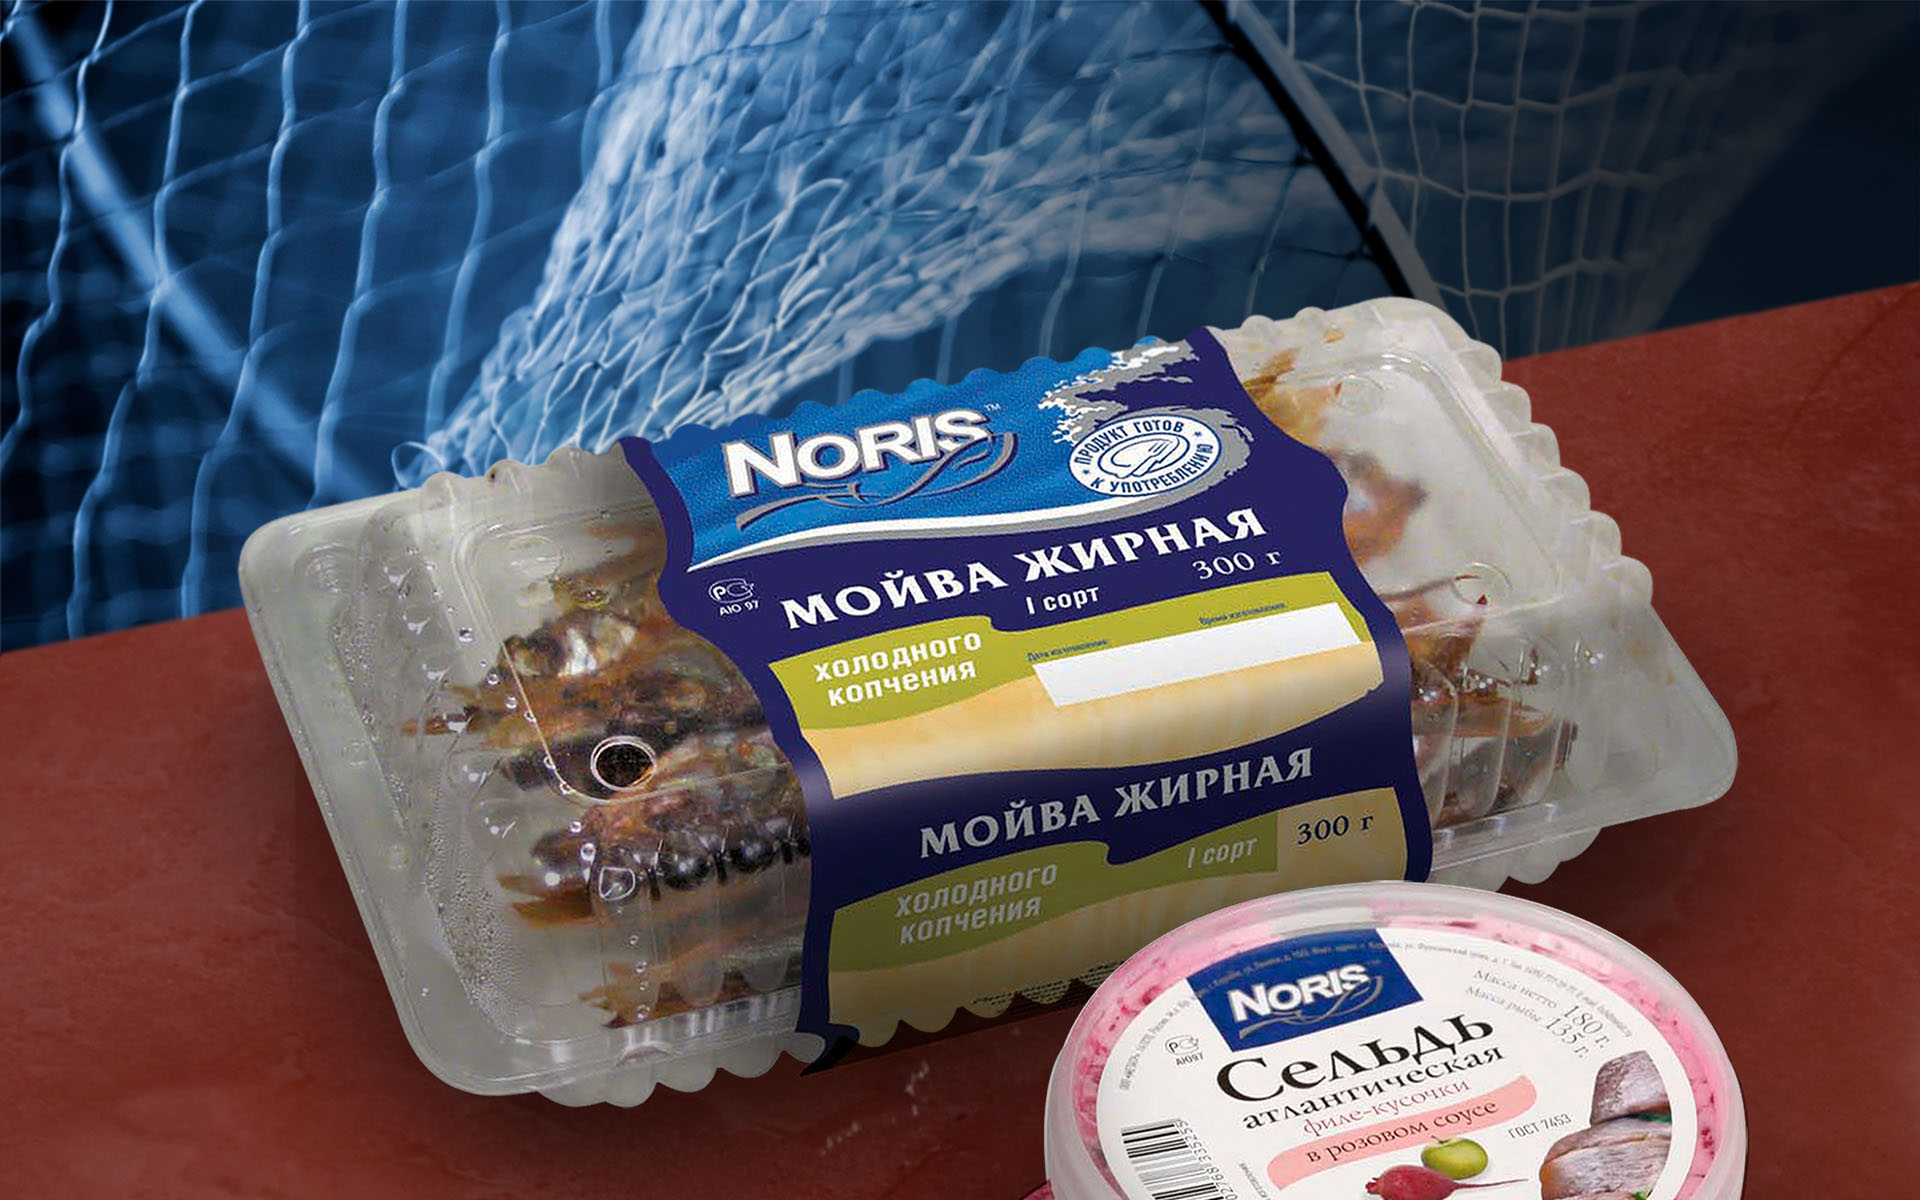 noris_800x1000_3 копия